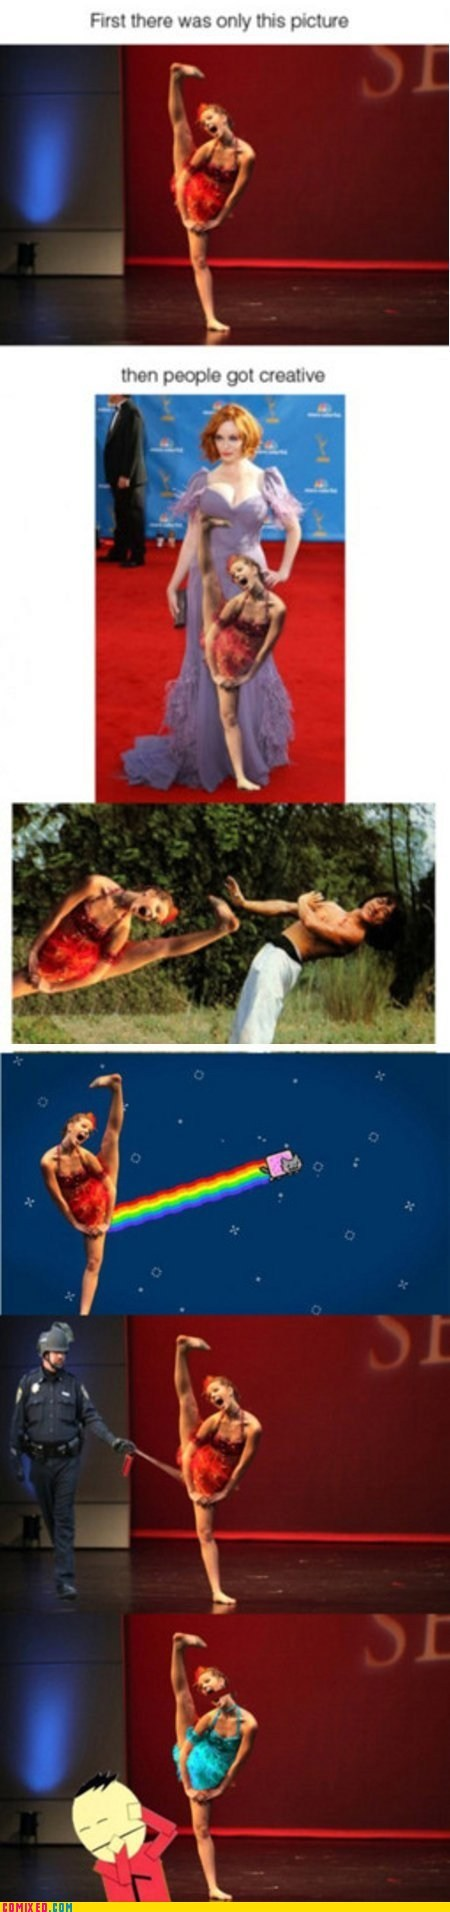 dance,kicking,photoshopped,the internets